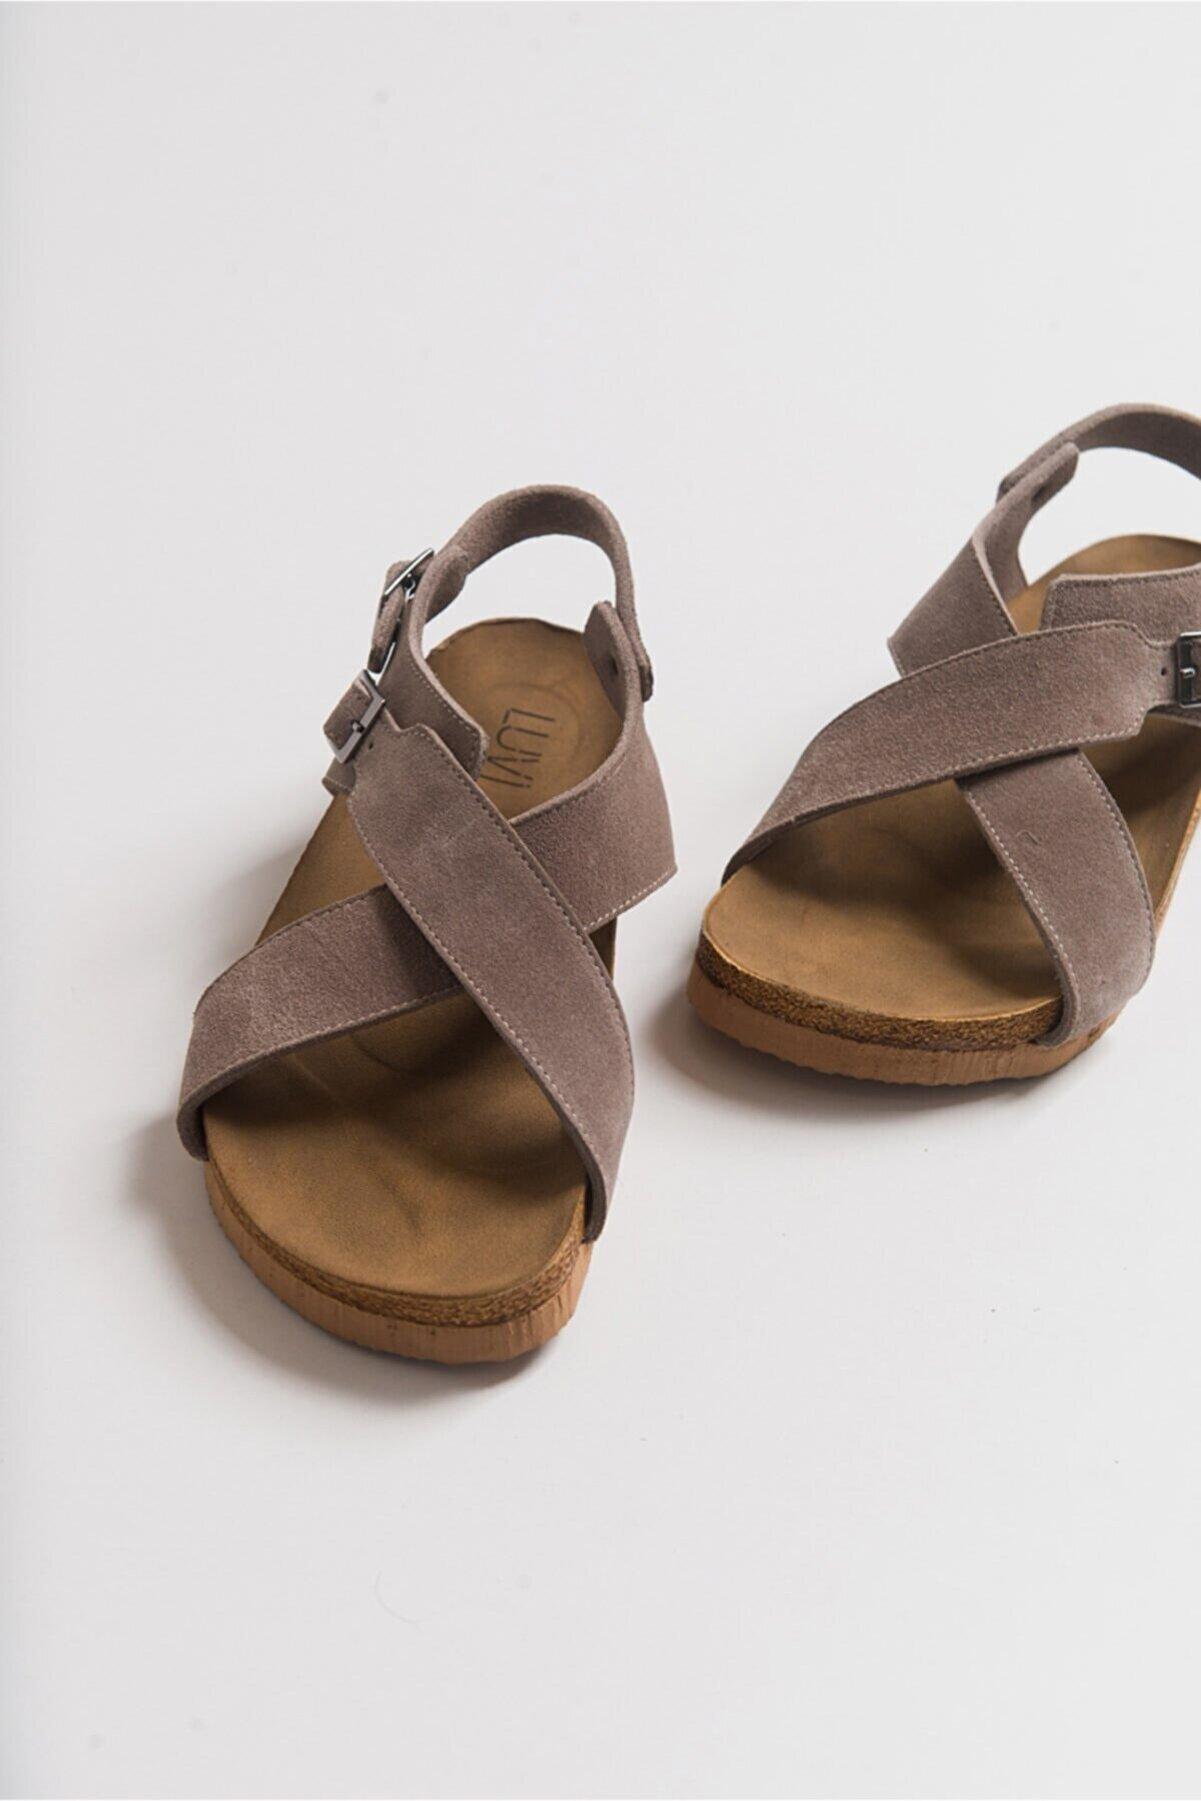 luvishoes 201 Hakiki Deri Vizon Süet Kadın Sandalet